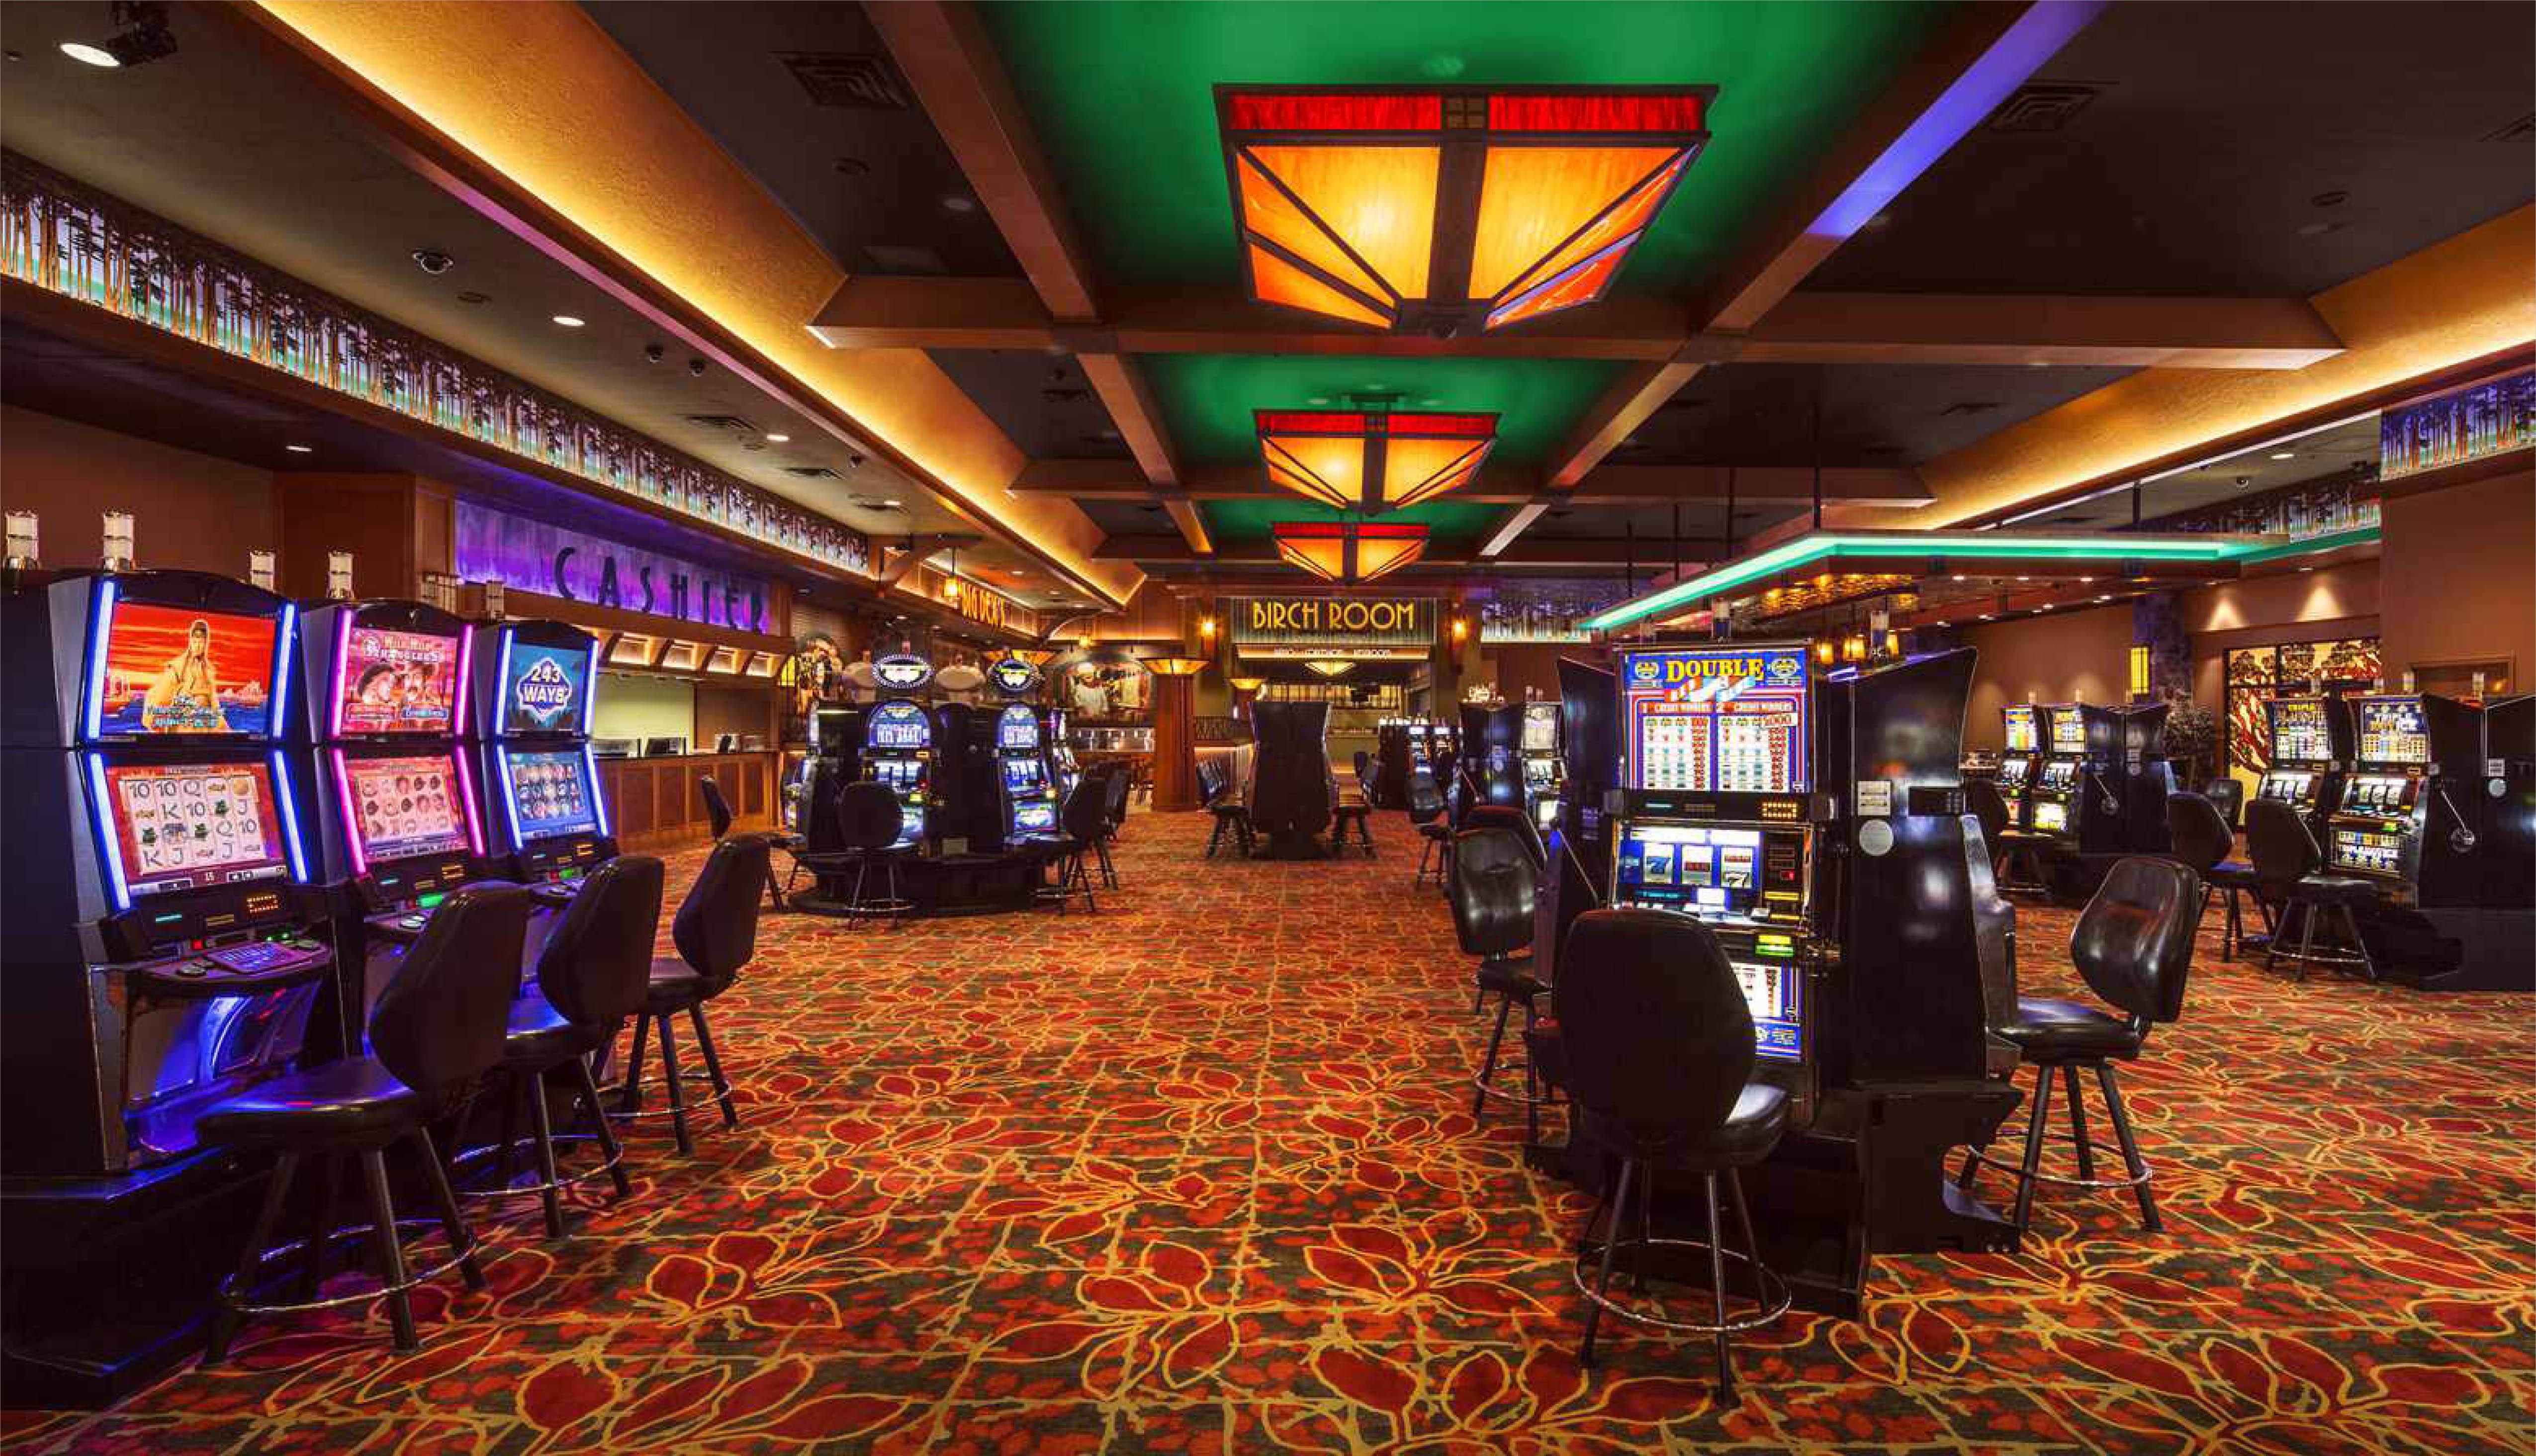 Leelanau sands casino suttons bay hack slot casino online